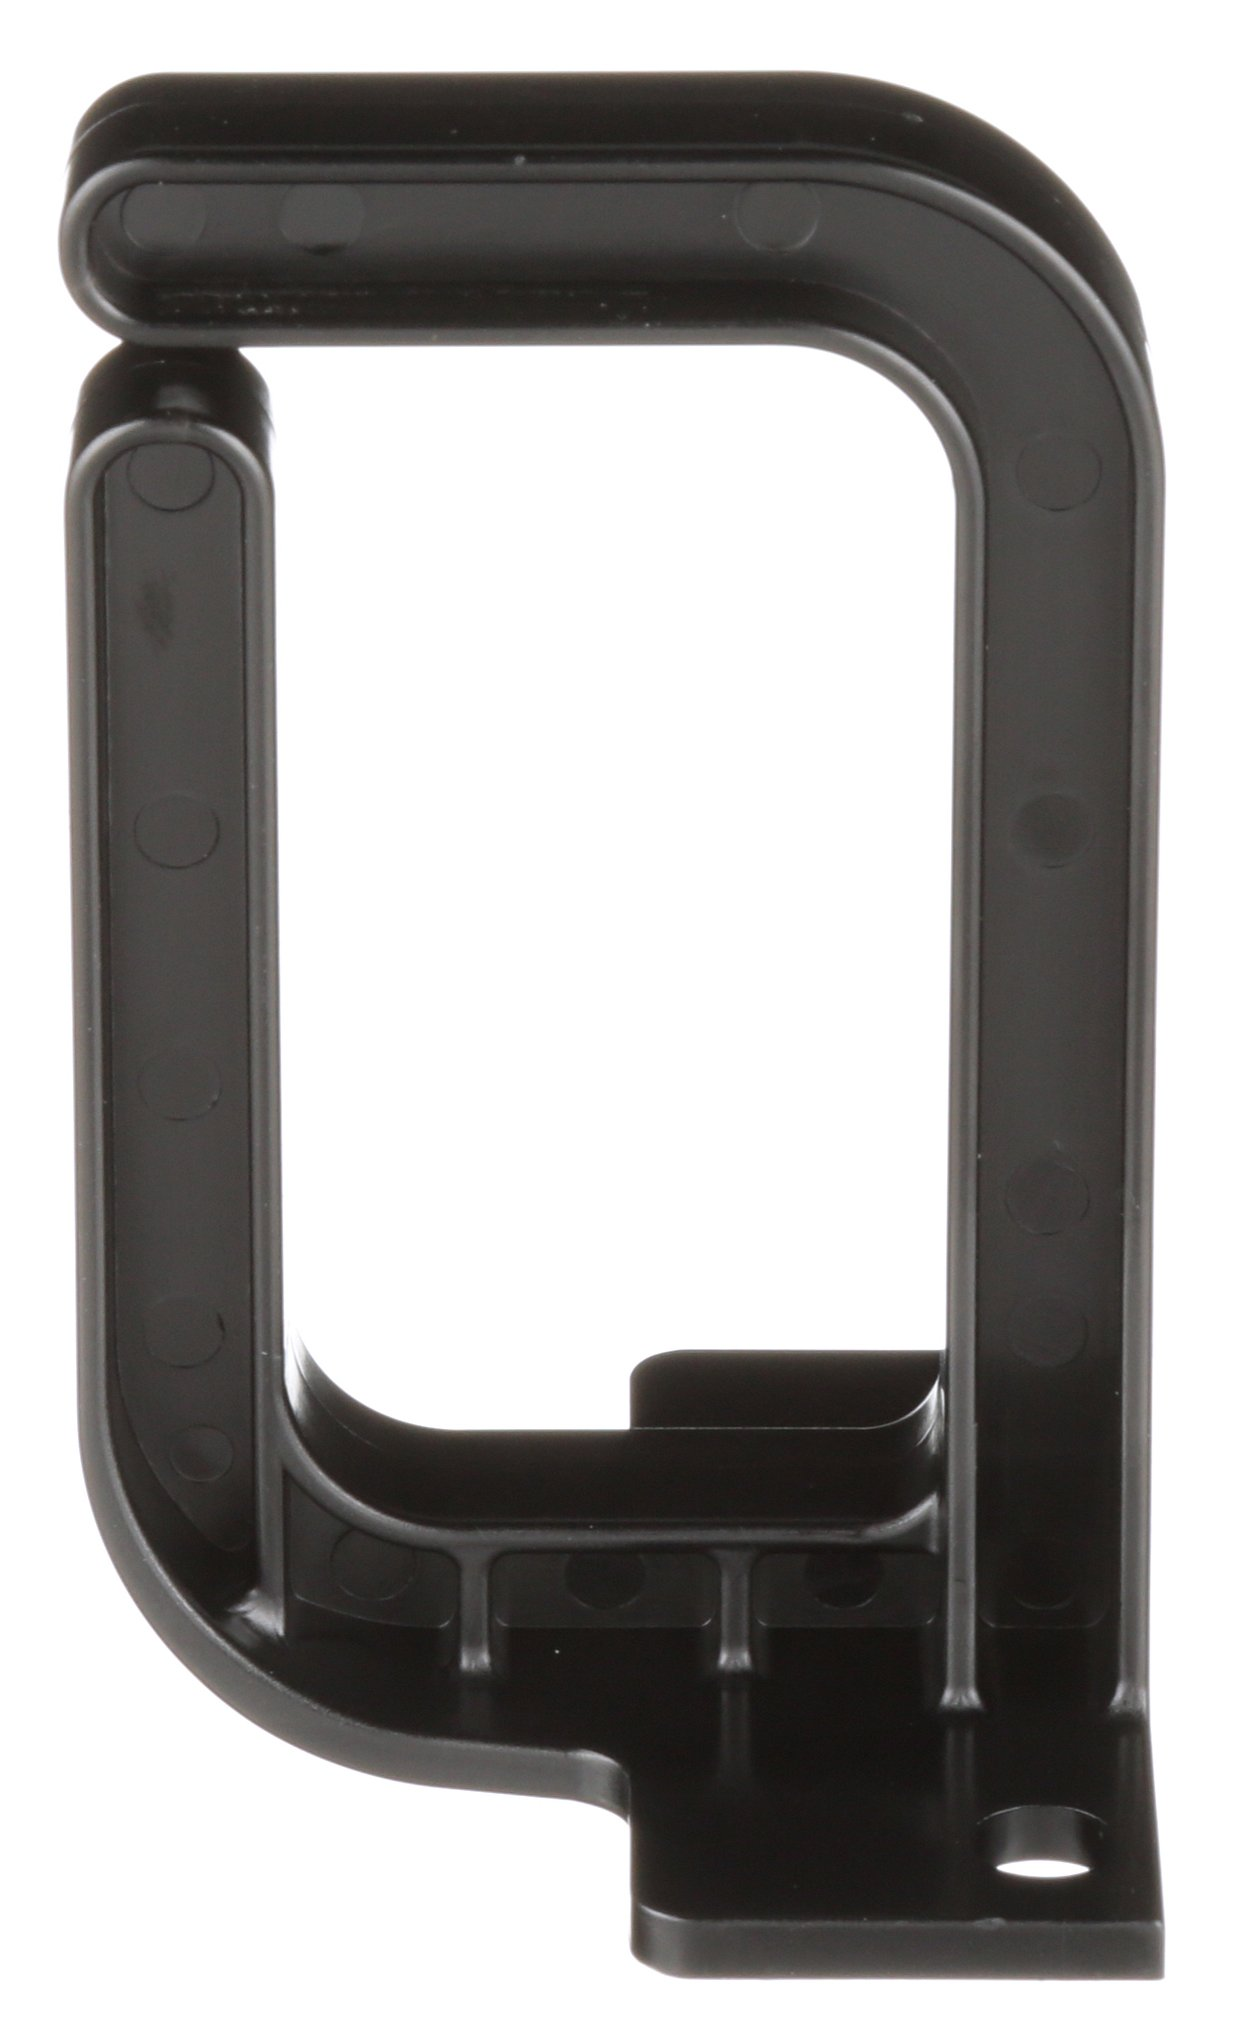 Panduit CMVDR1 Vertical Cable Management D-Ring, 1-Inch Wide, Black